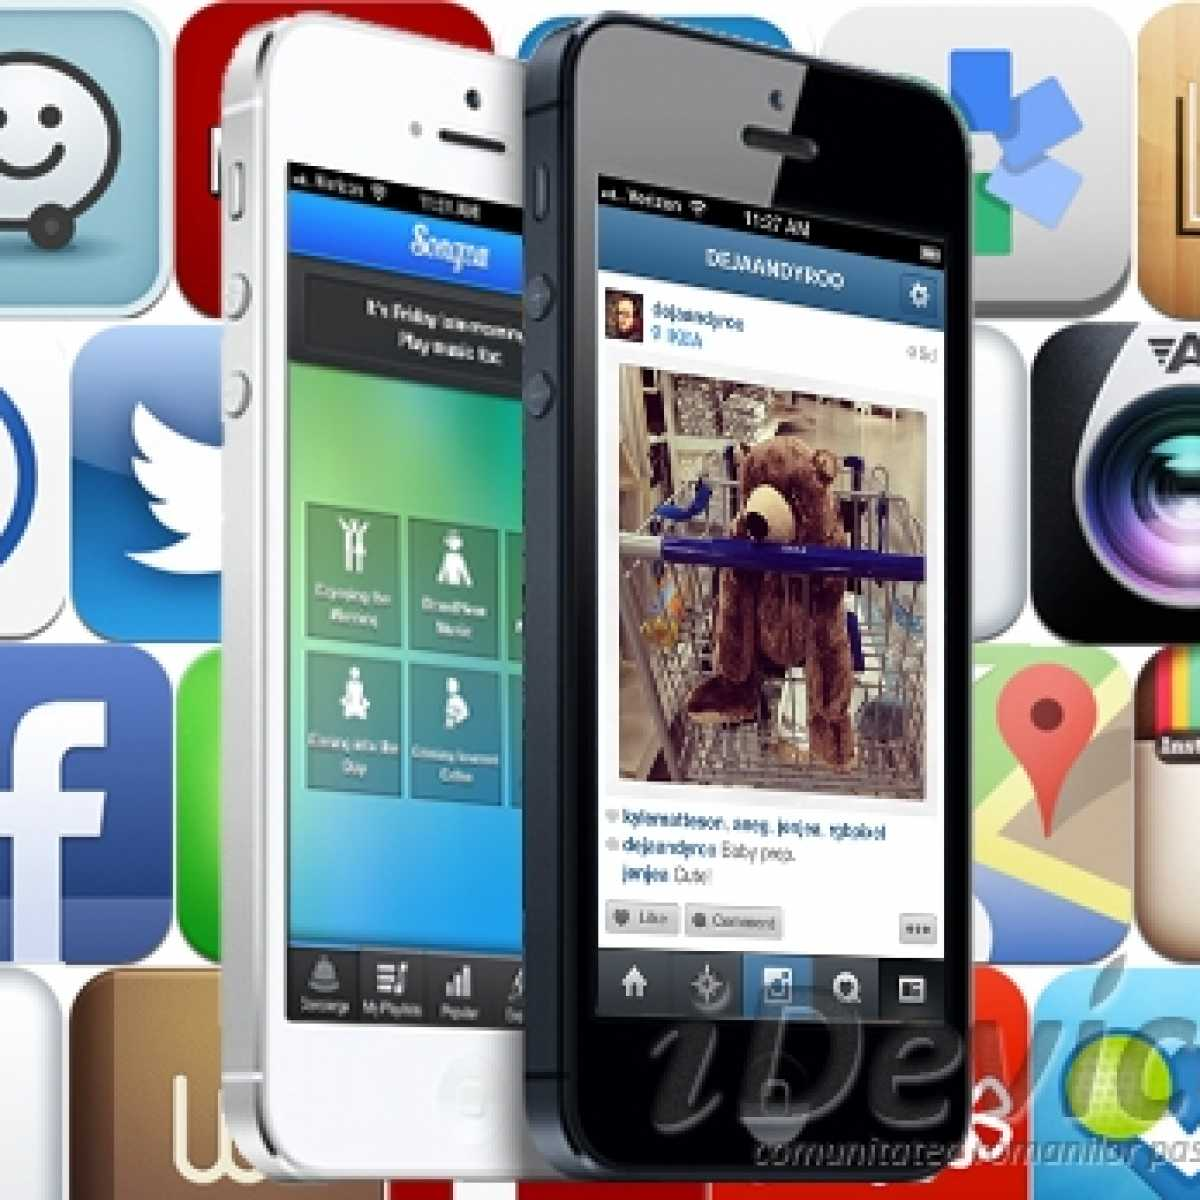 Aplica ie gratuita iPhone intalnire)